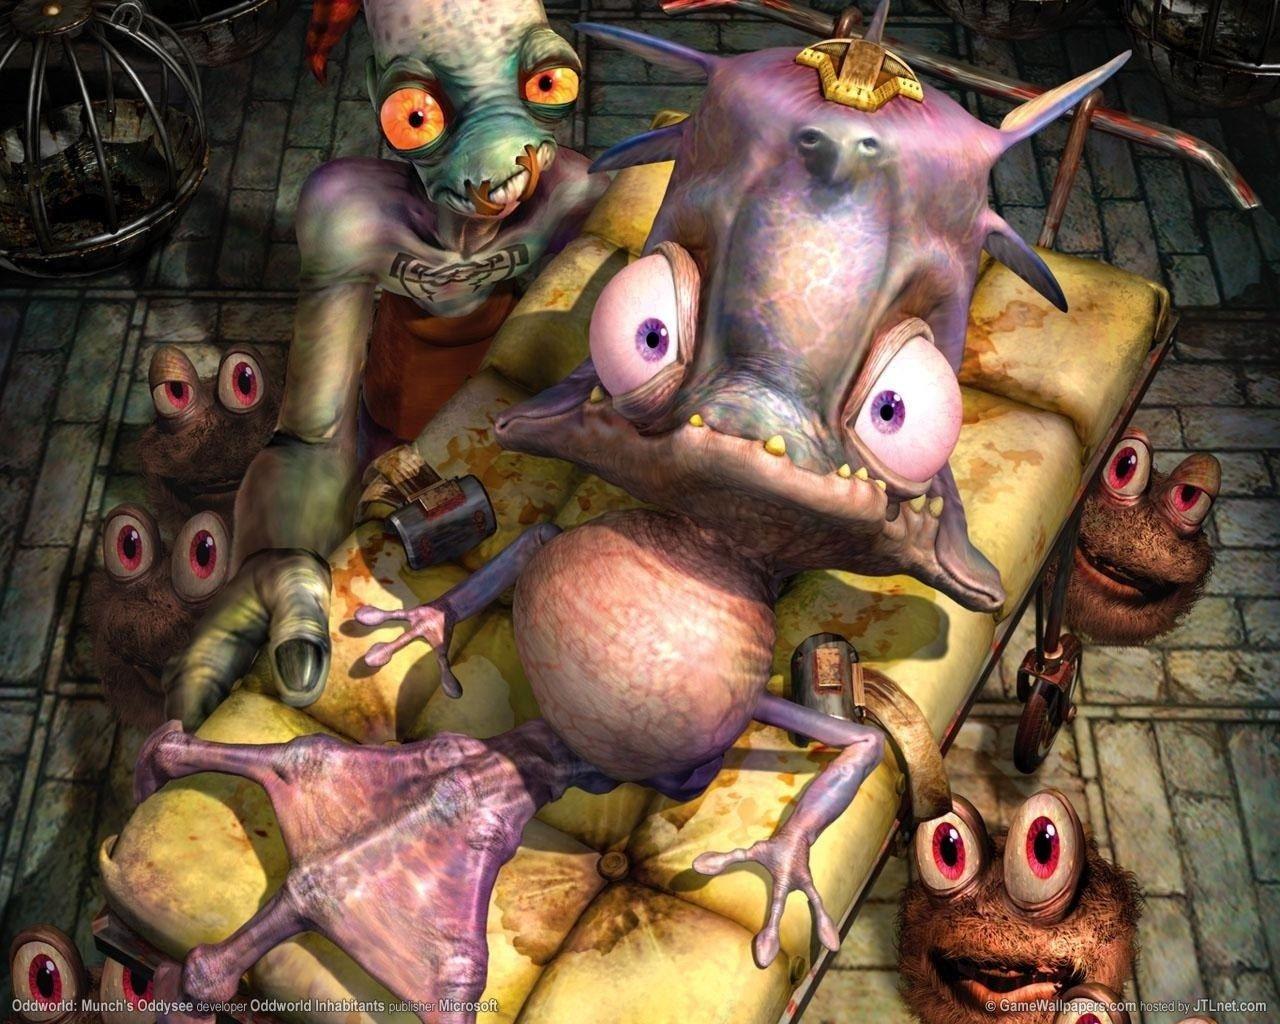 oddworld desktop nexus wallpaper | Art, Game art, Gaming posters